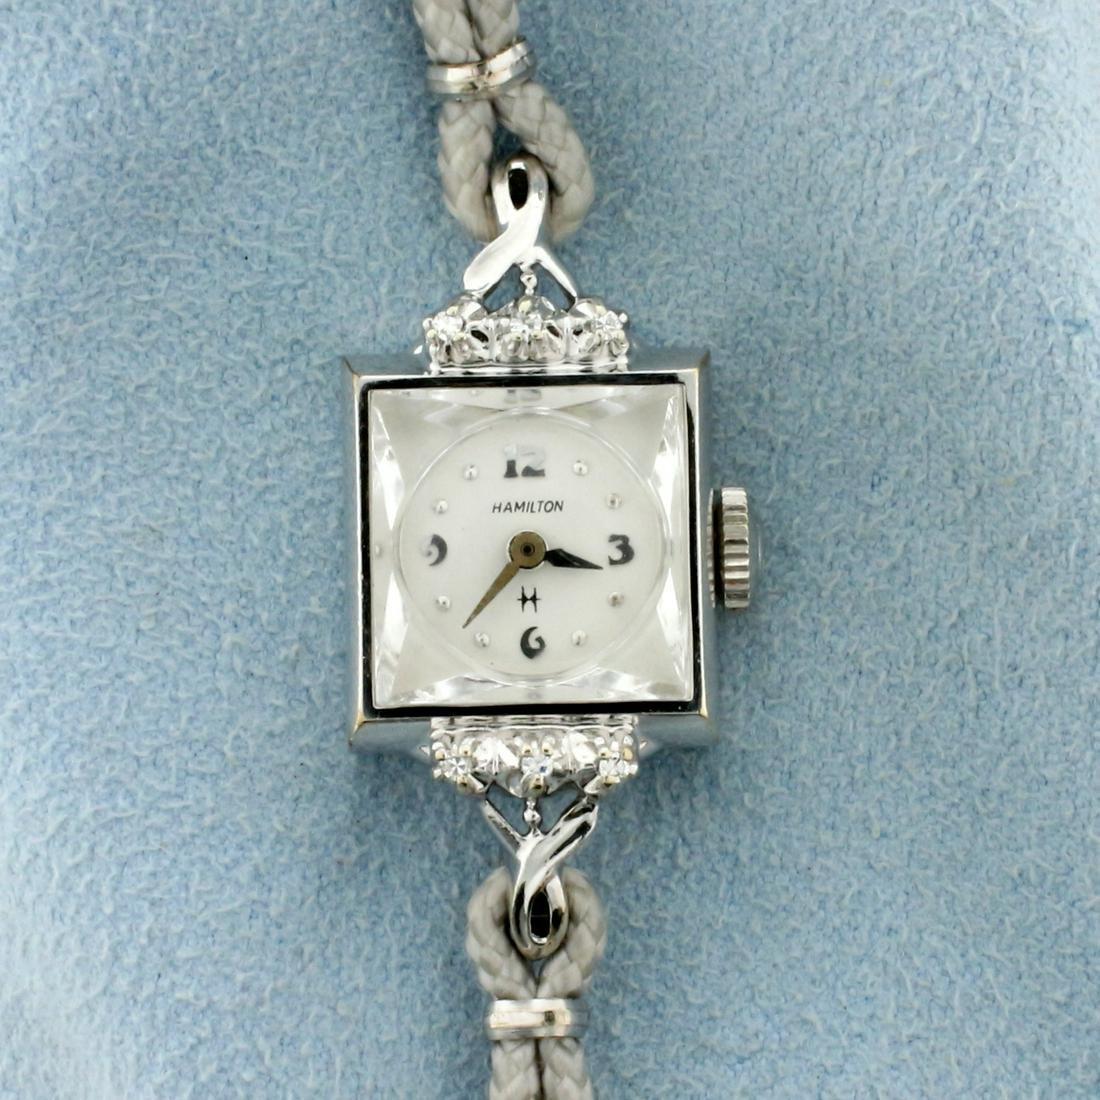 Antique Hamilton Diamond Watch with Solid 10k White